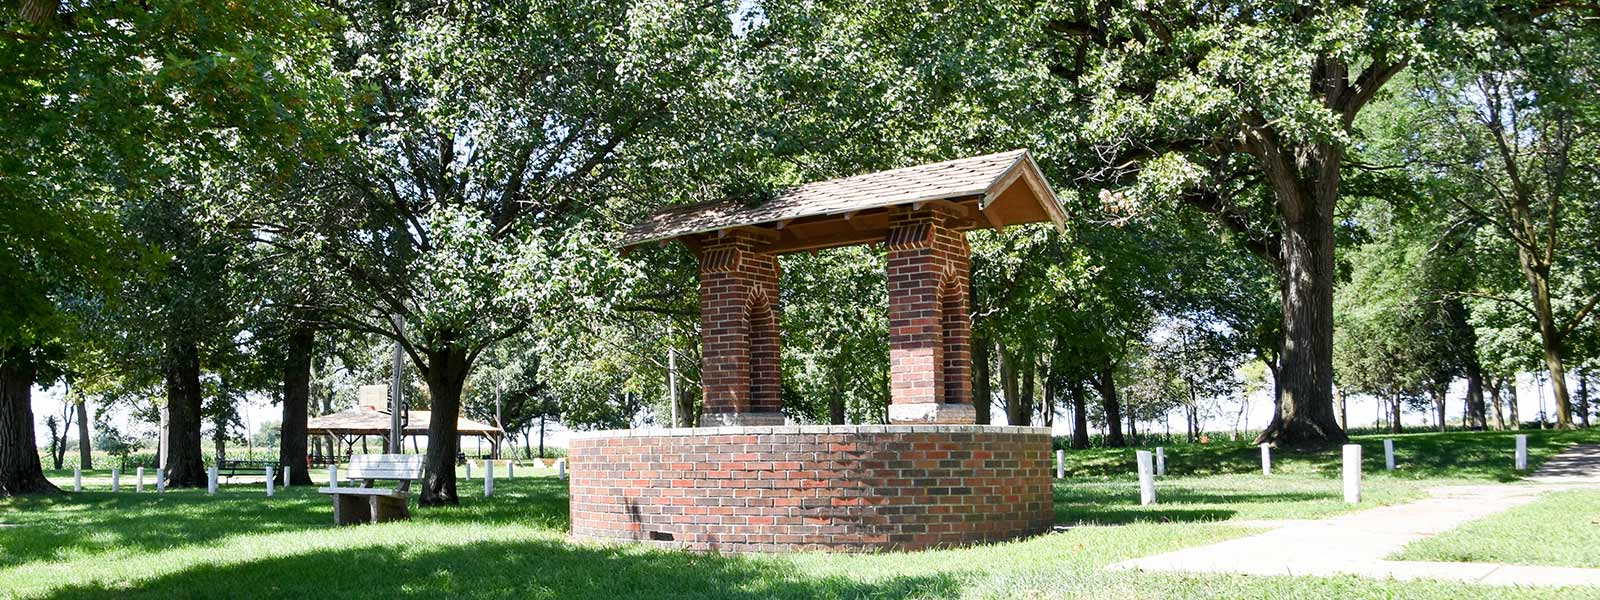 Edgewood Park Shelter